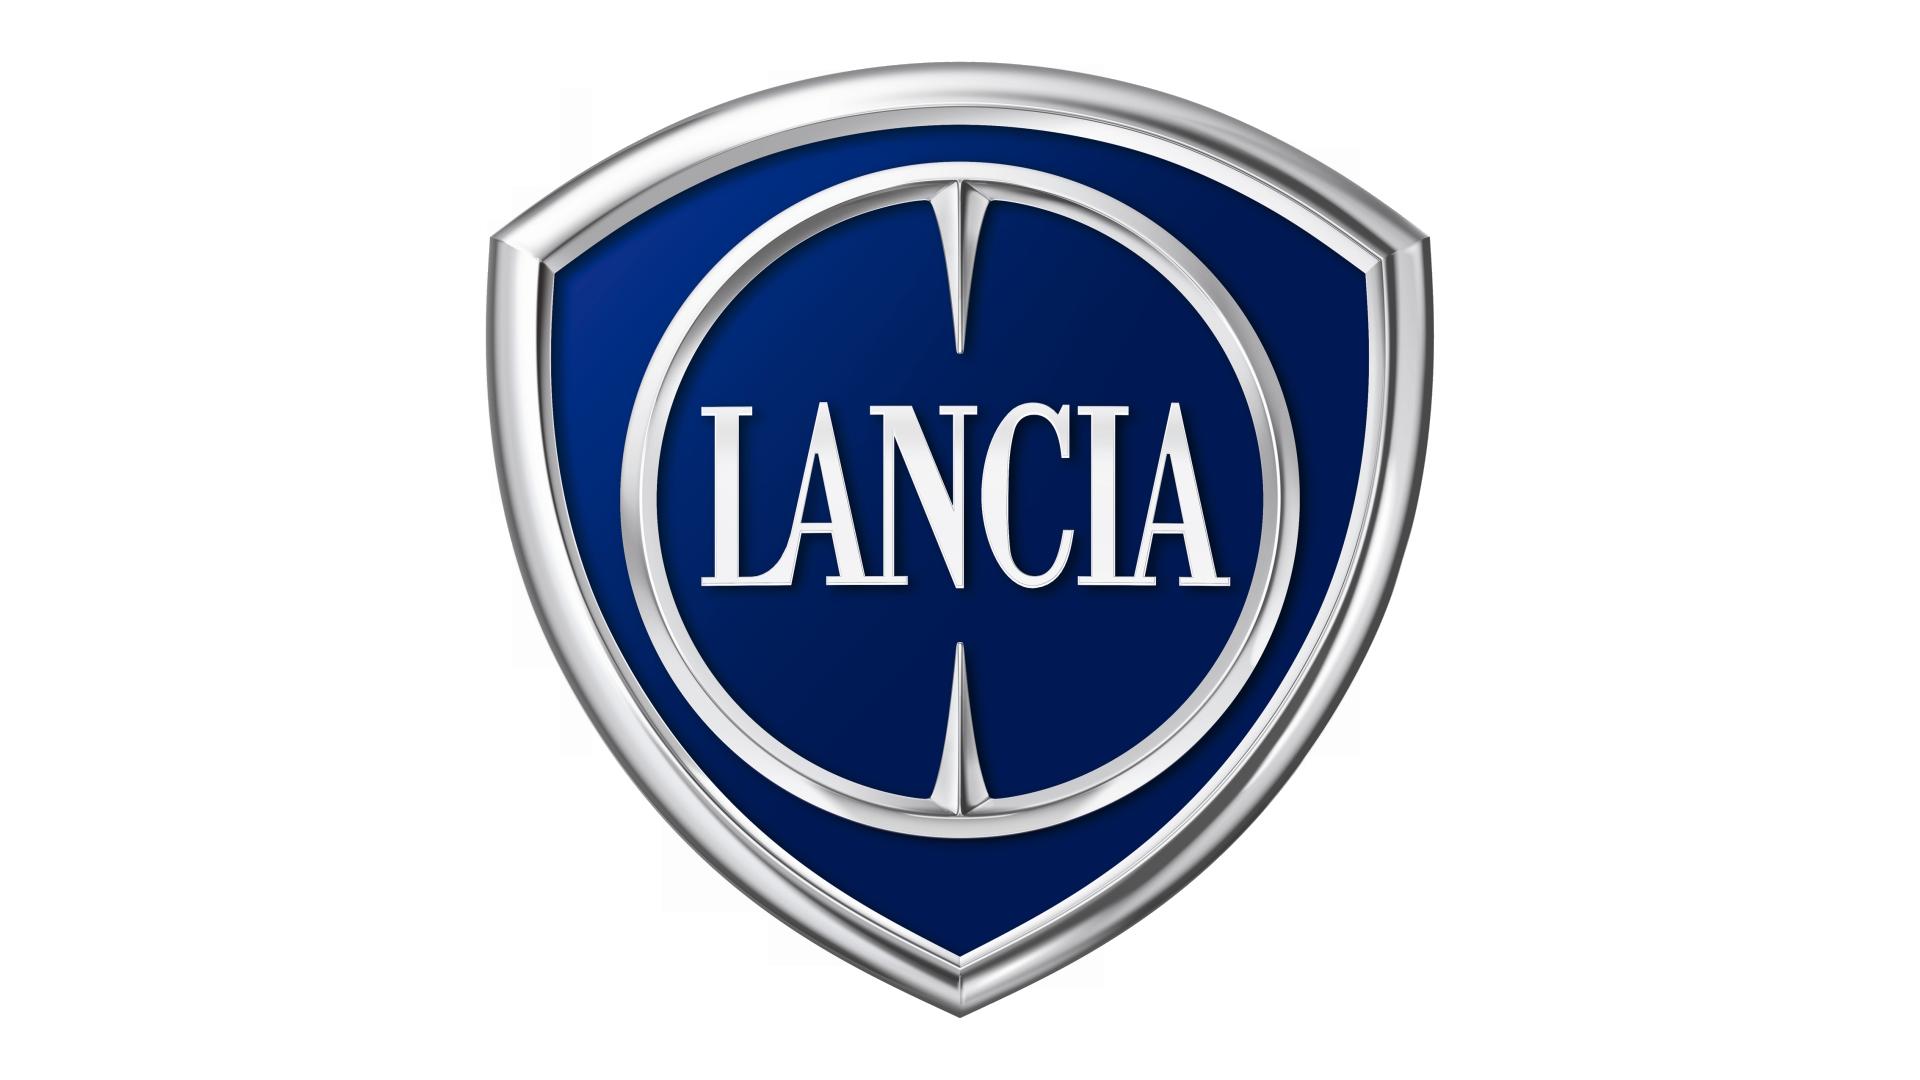 Lancia Logo, HD Png, Meaning, Information.